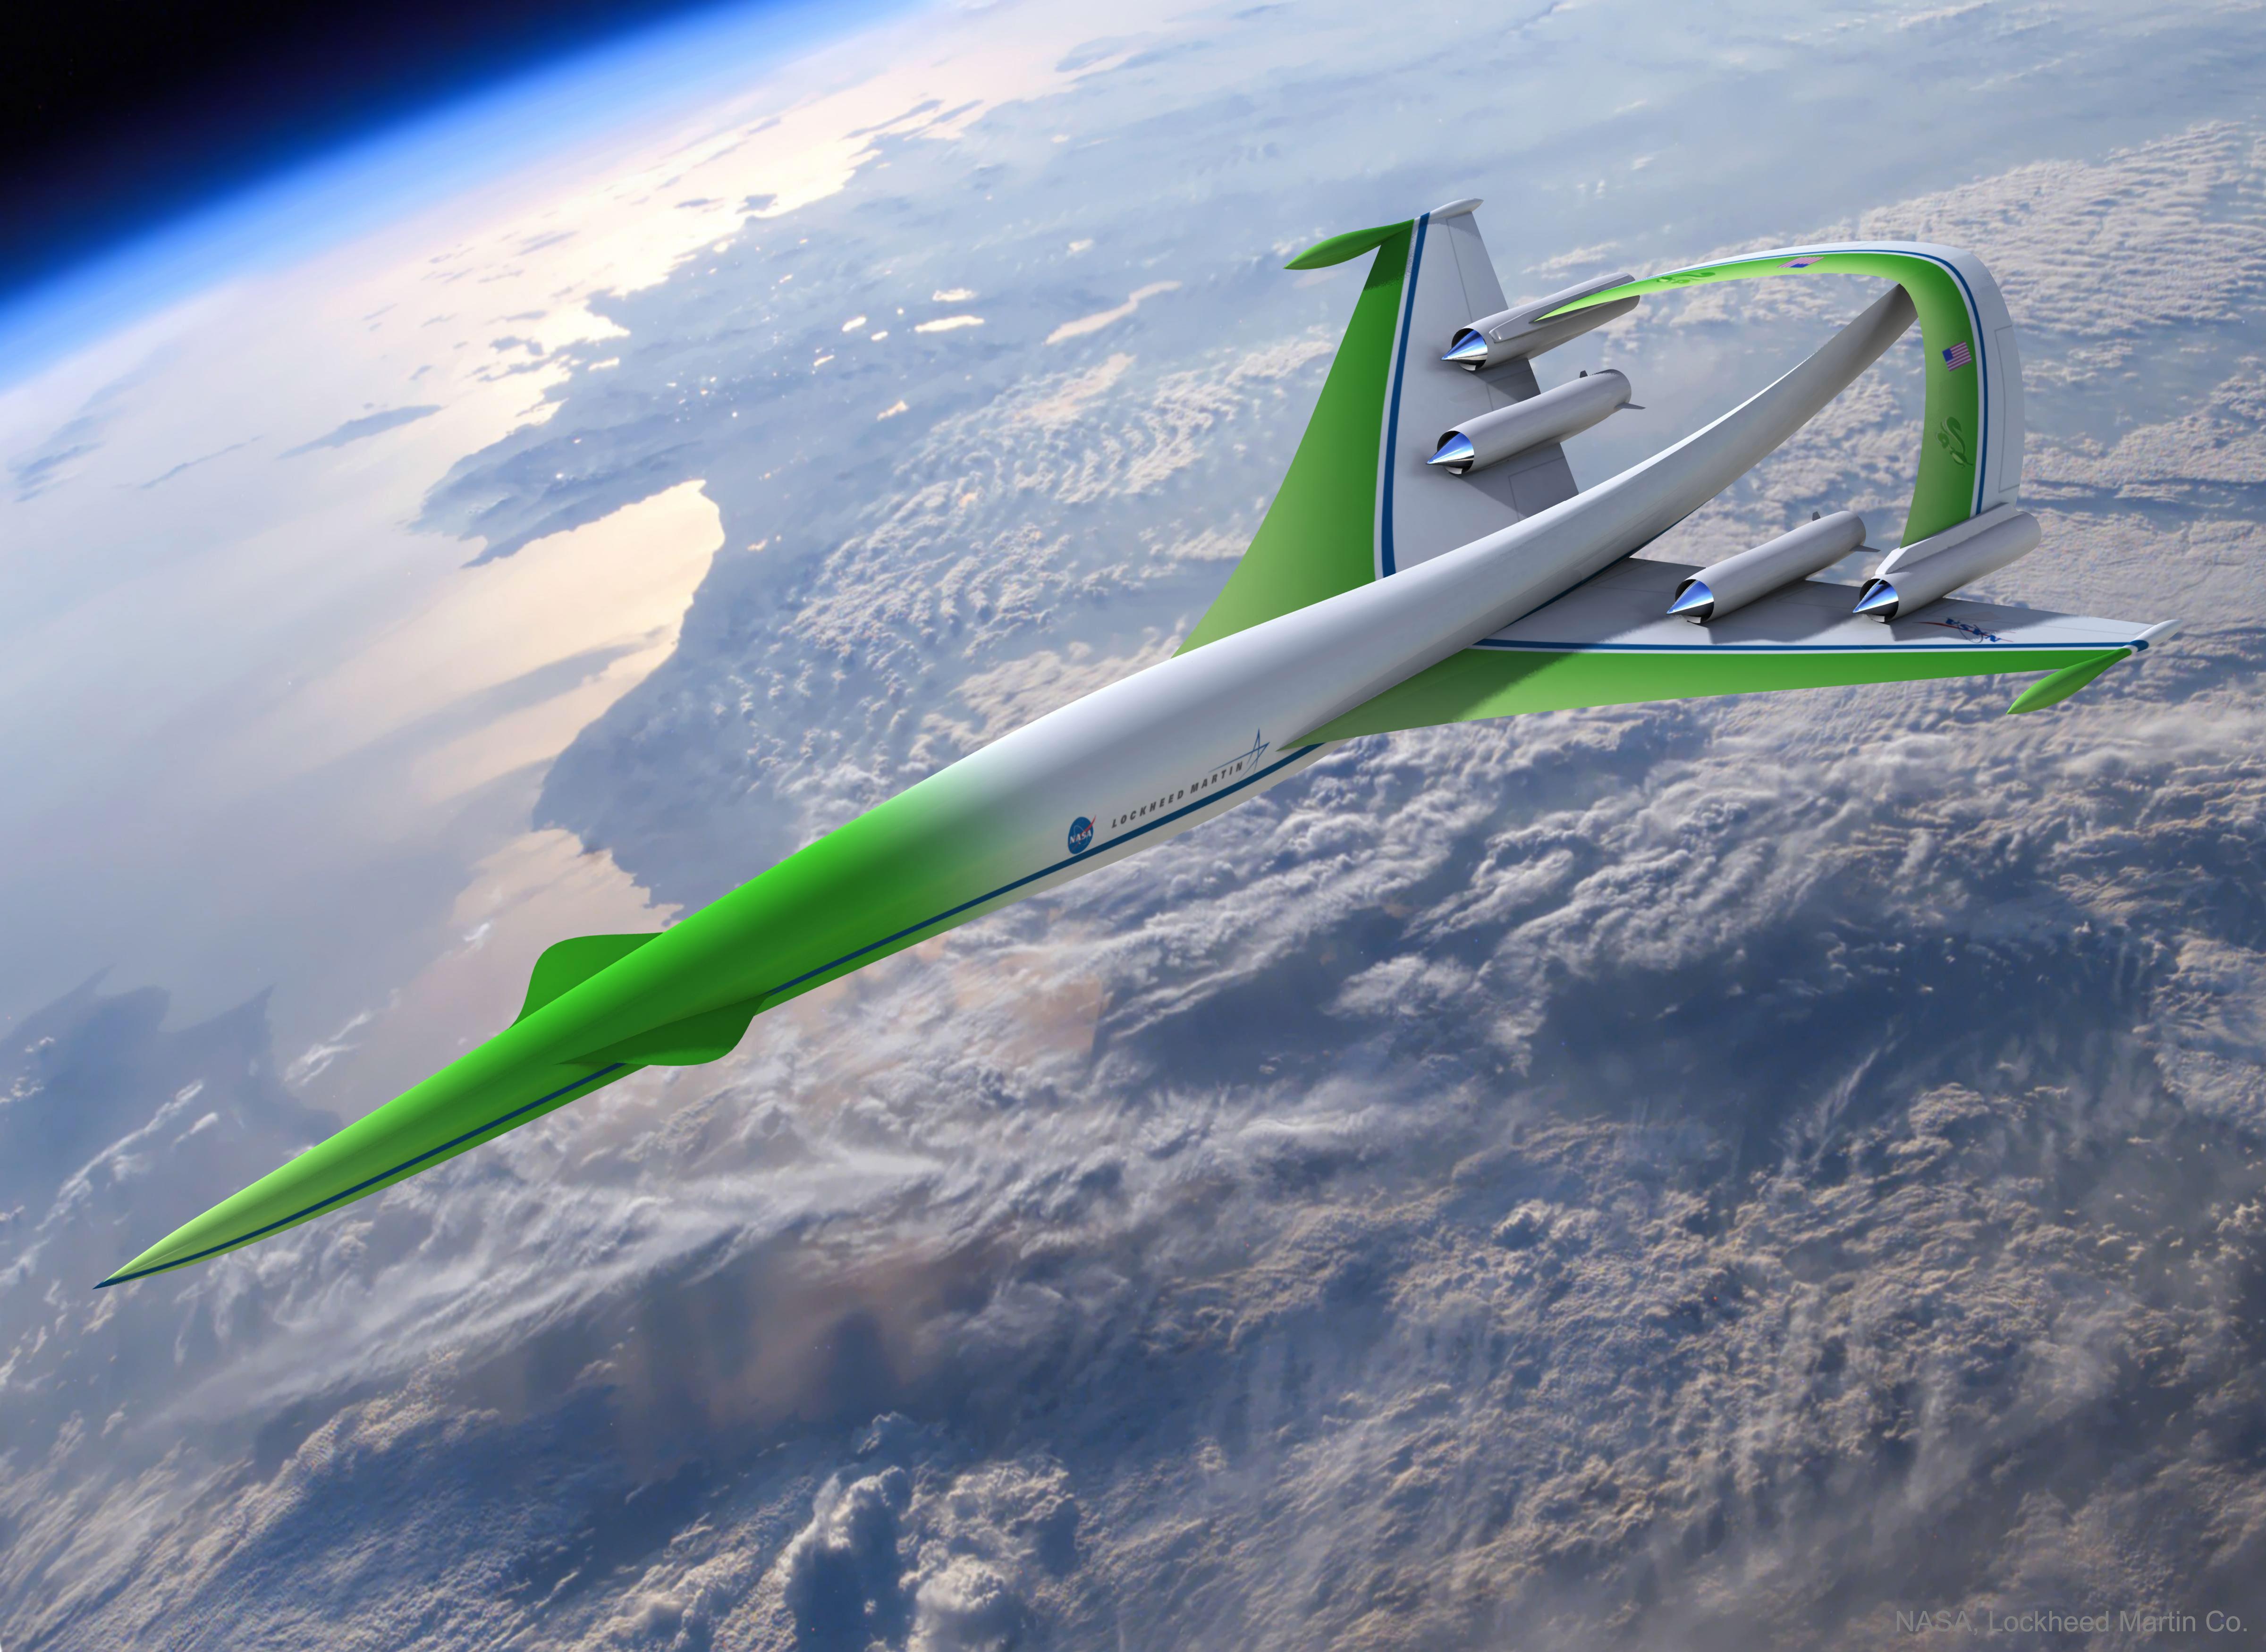 2017 October 1 - Concept Plane: Supersonic Green Machine